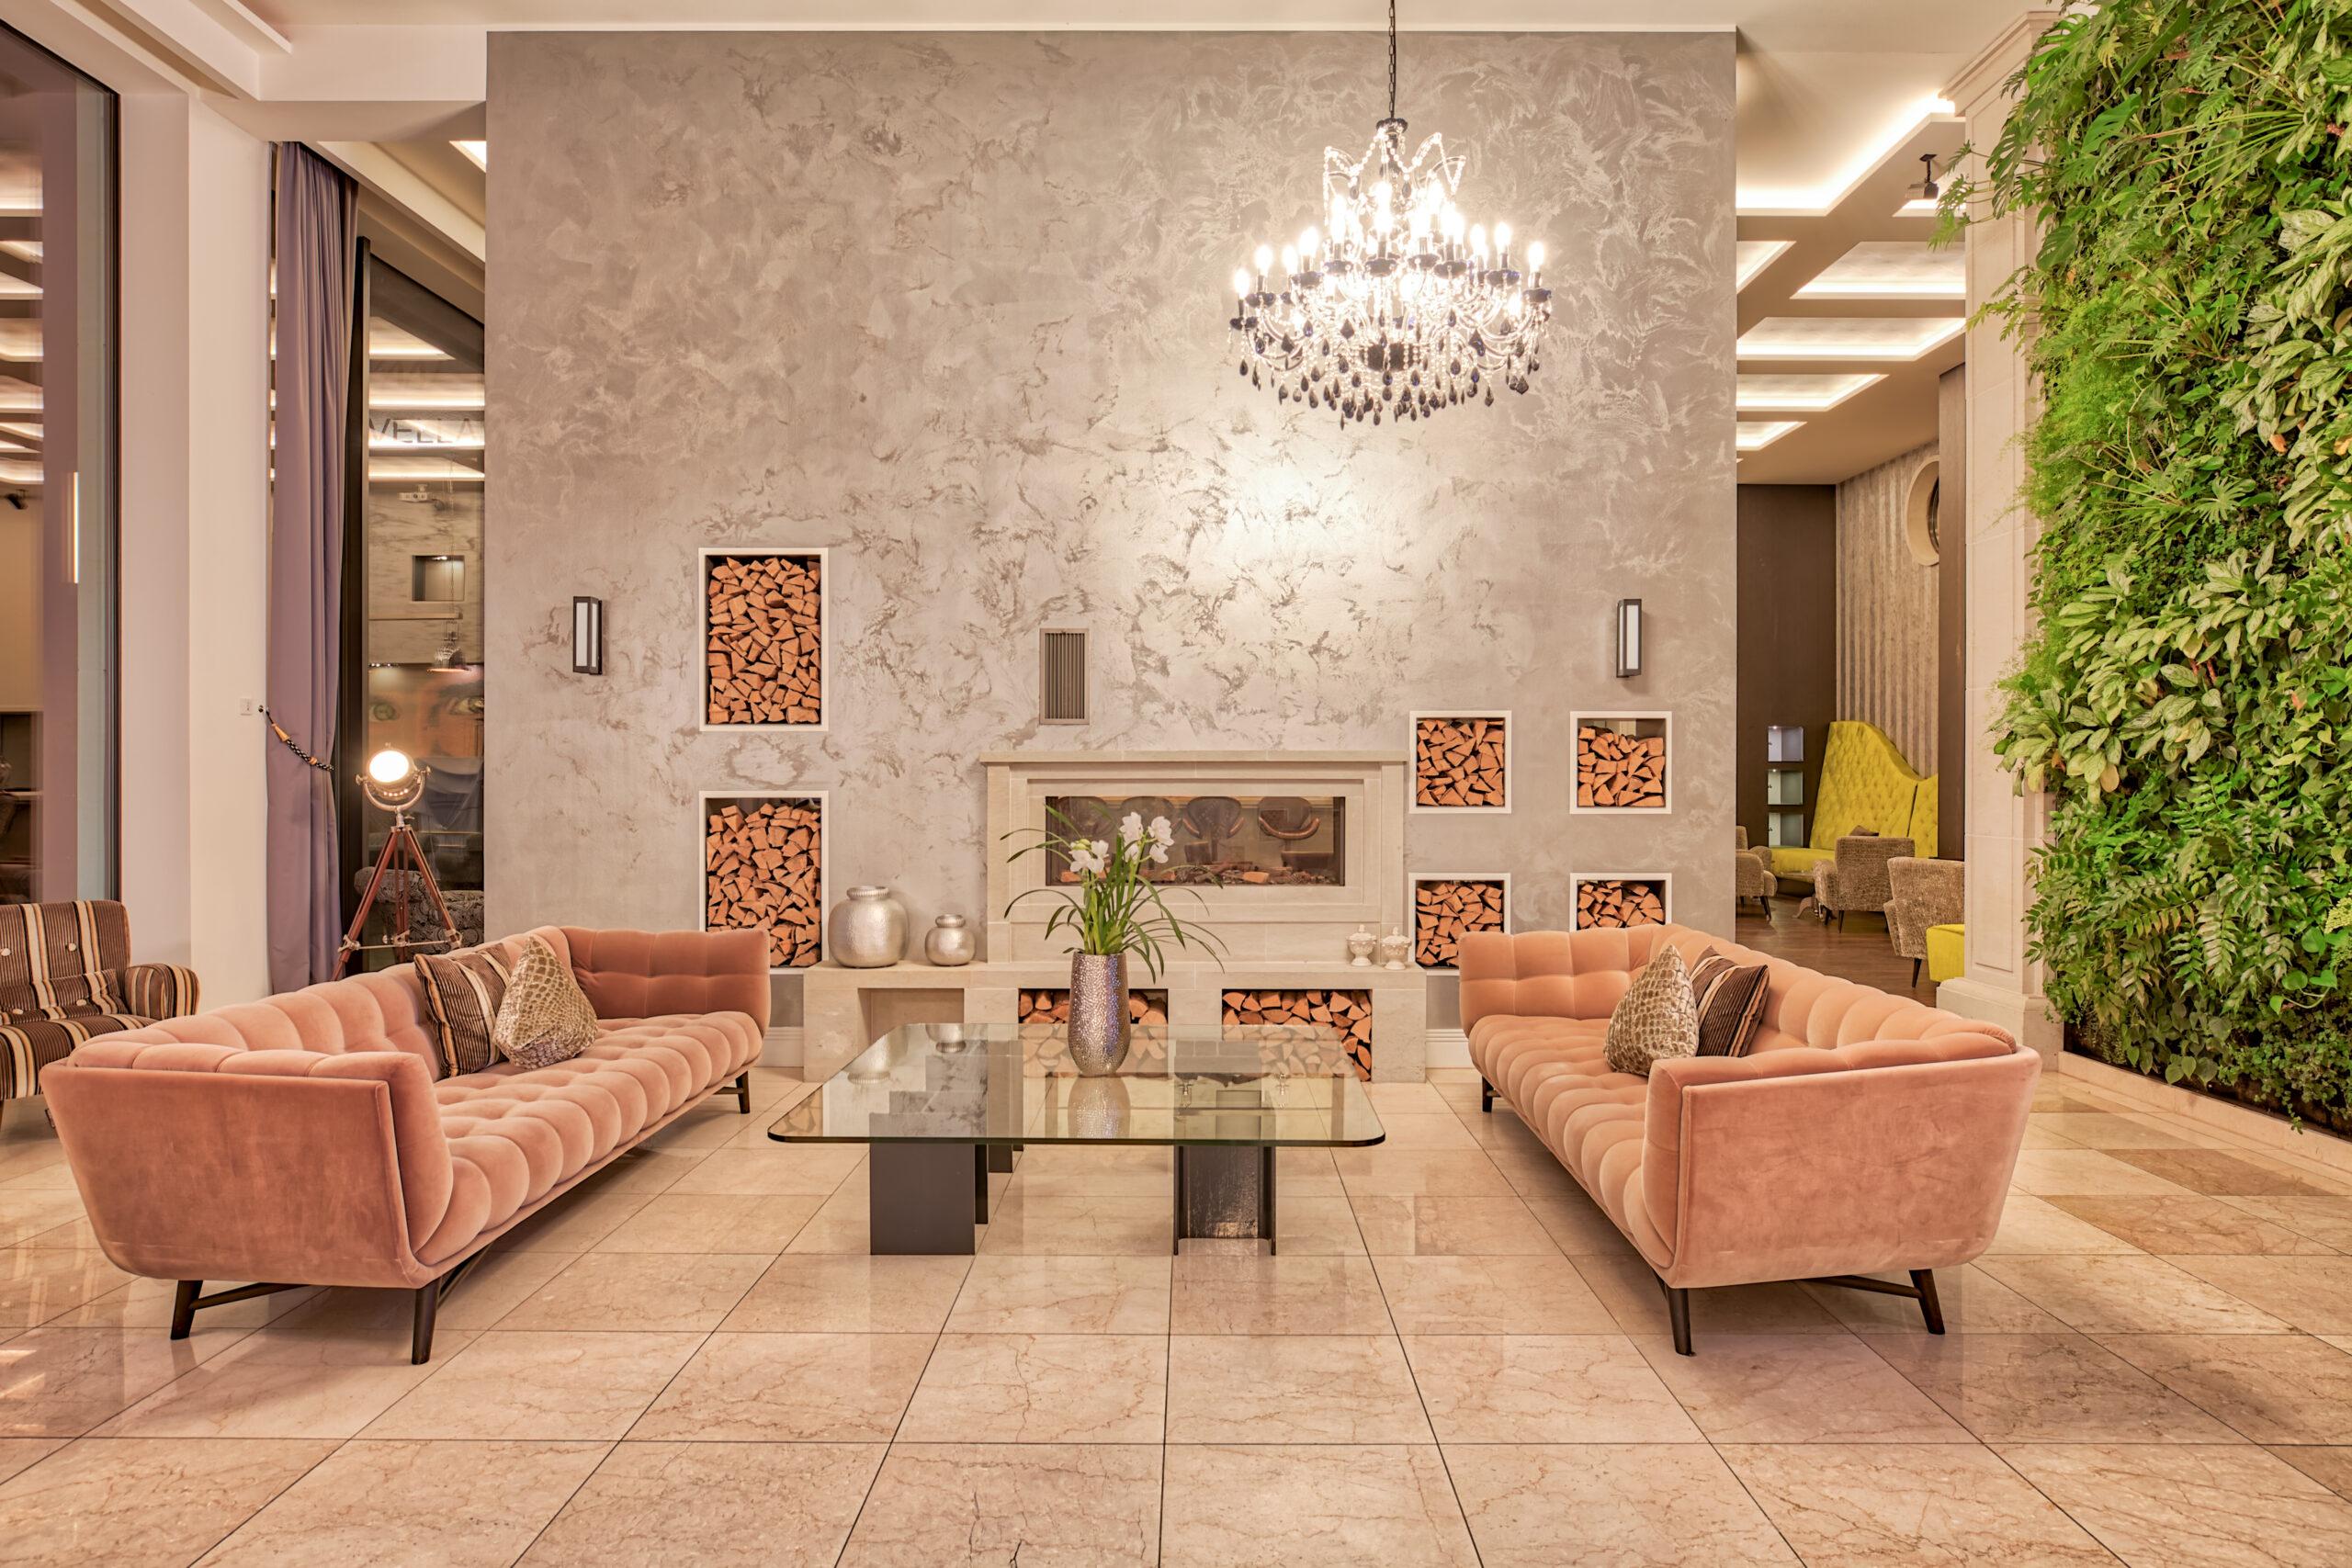 Prora Solitaire Apartments & Spa